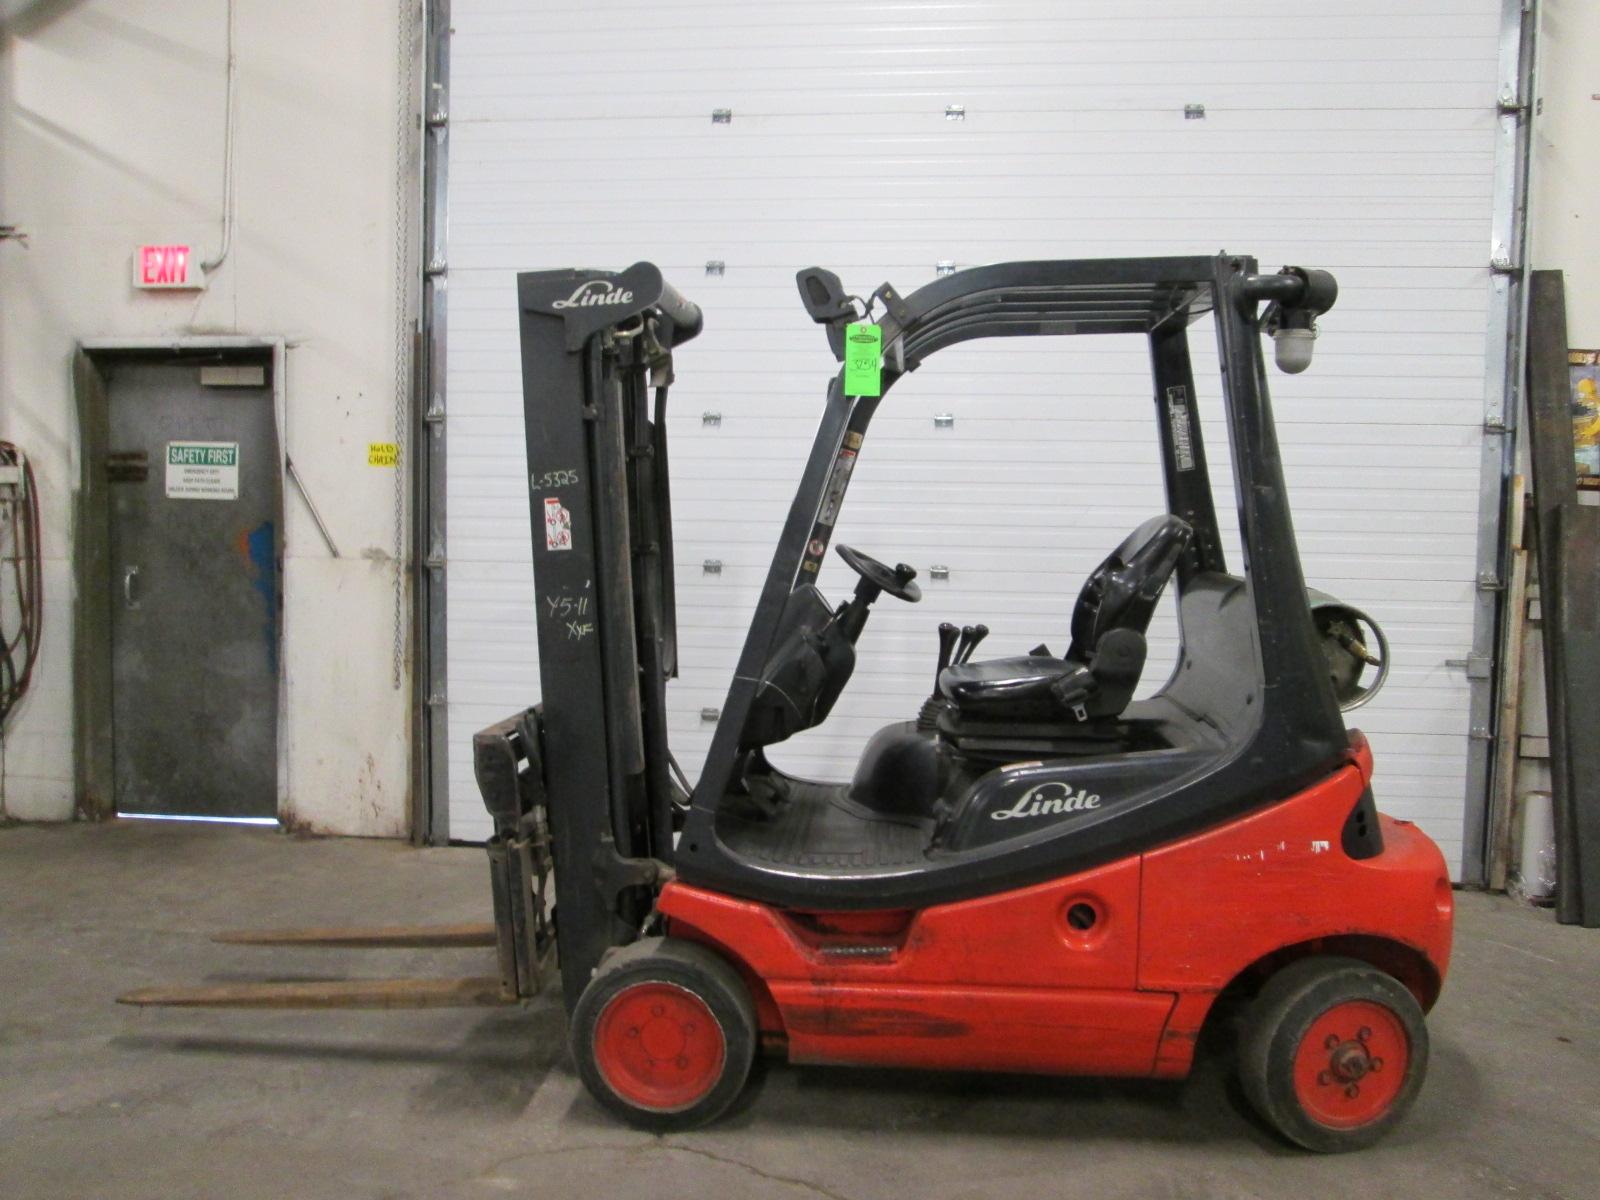 2006 linde model h20ct 03 forklift lpg propane 4000lbs capacity rh bidspotter com Owner's Manual Service ManualsOnline